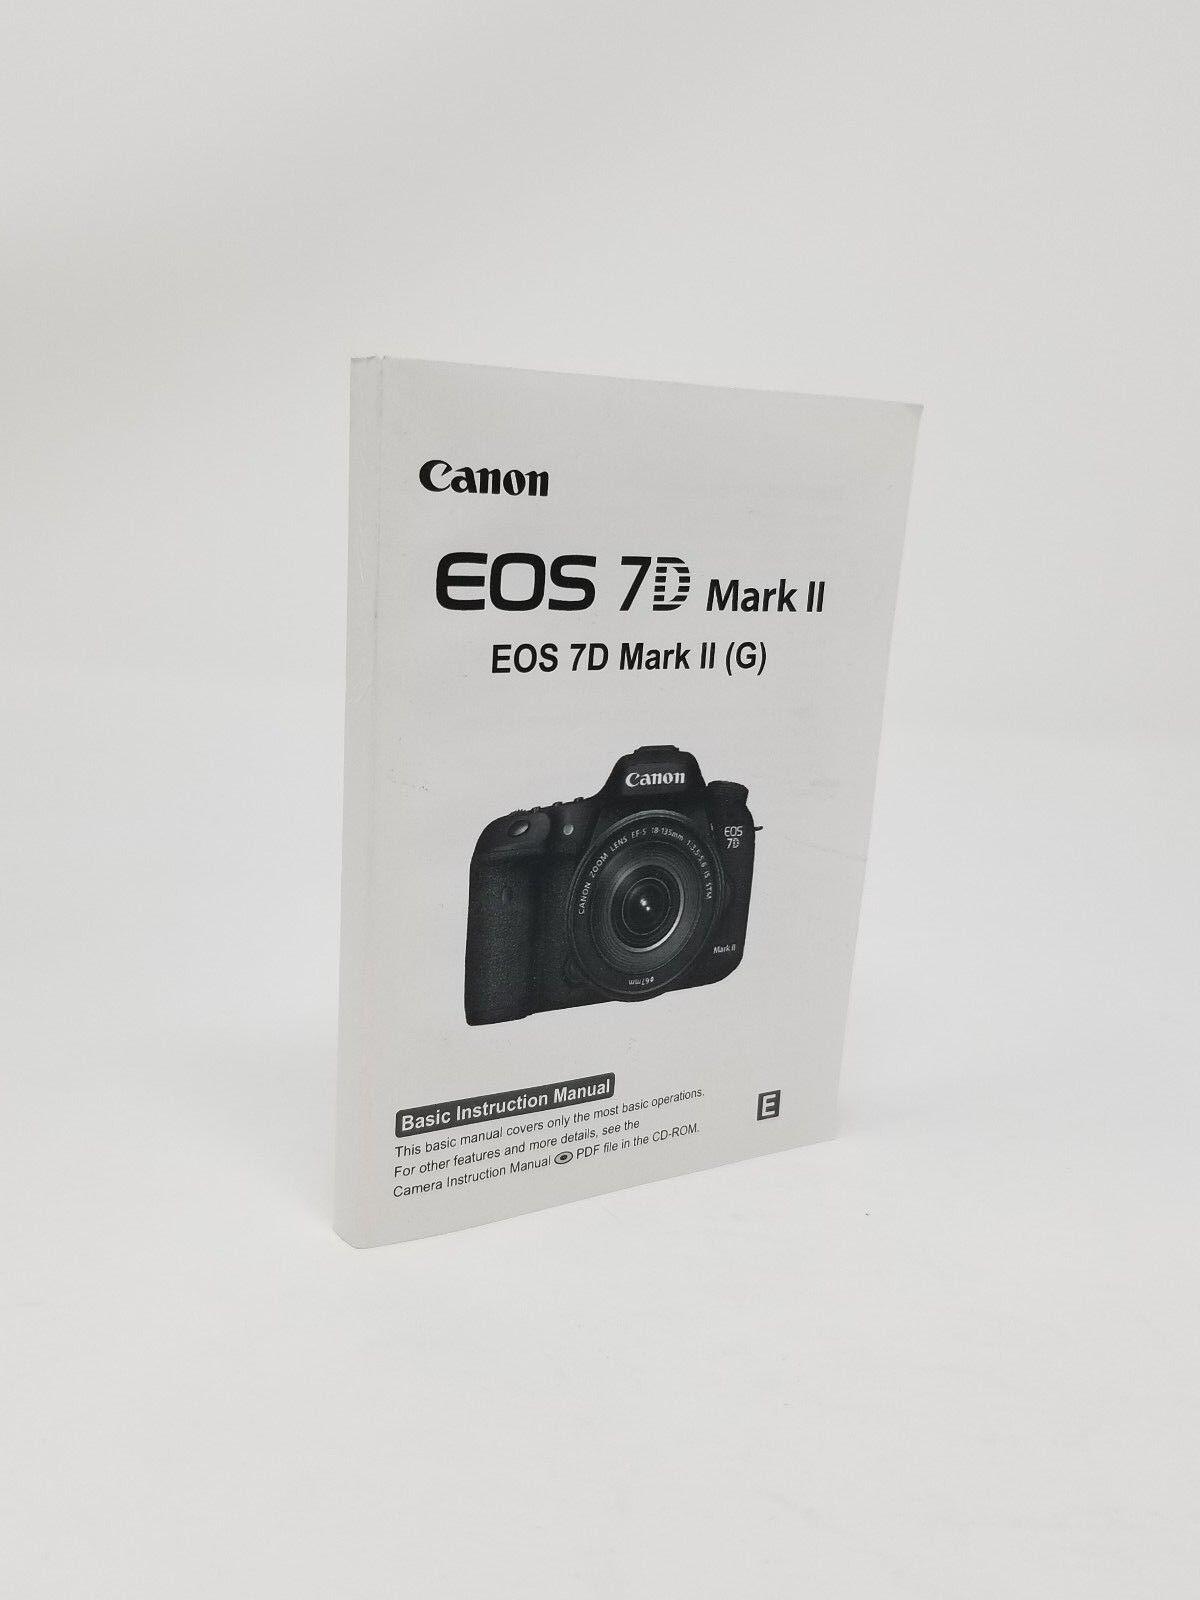 canon eos 7d mark ii genuine instruction owners manual book original rh bayshop com canon eos 7d service manual pdf canon eos 7d user manual